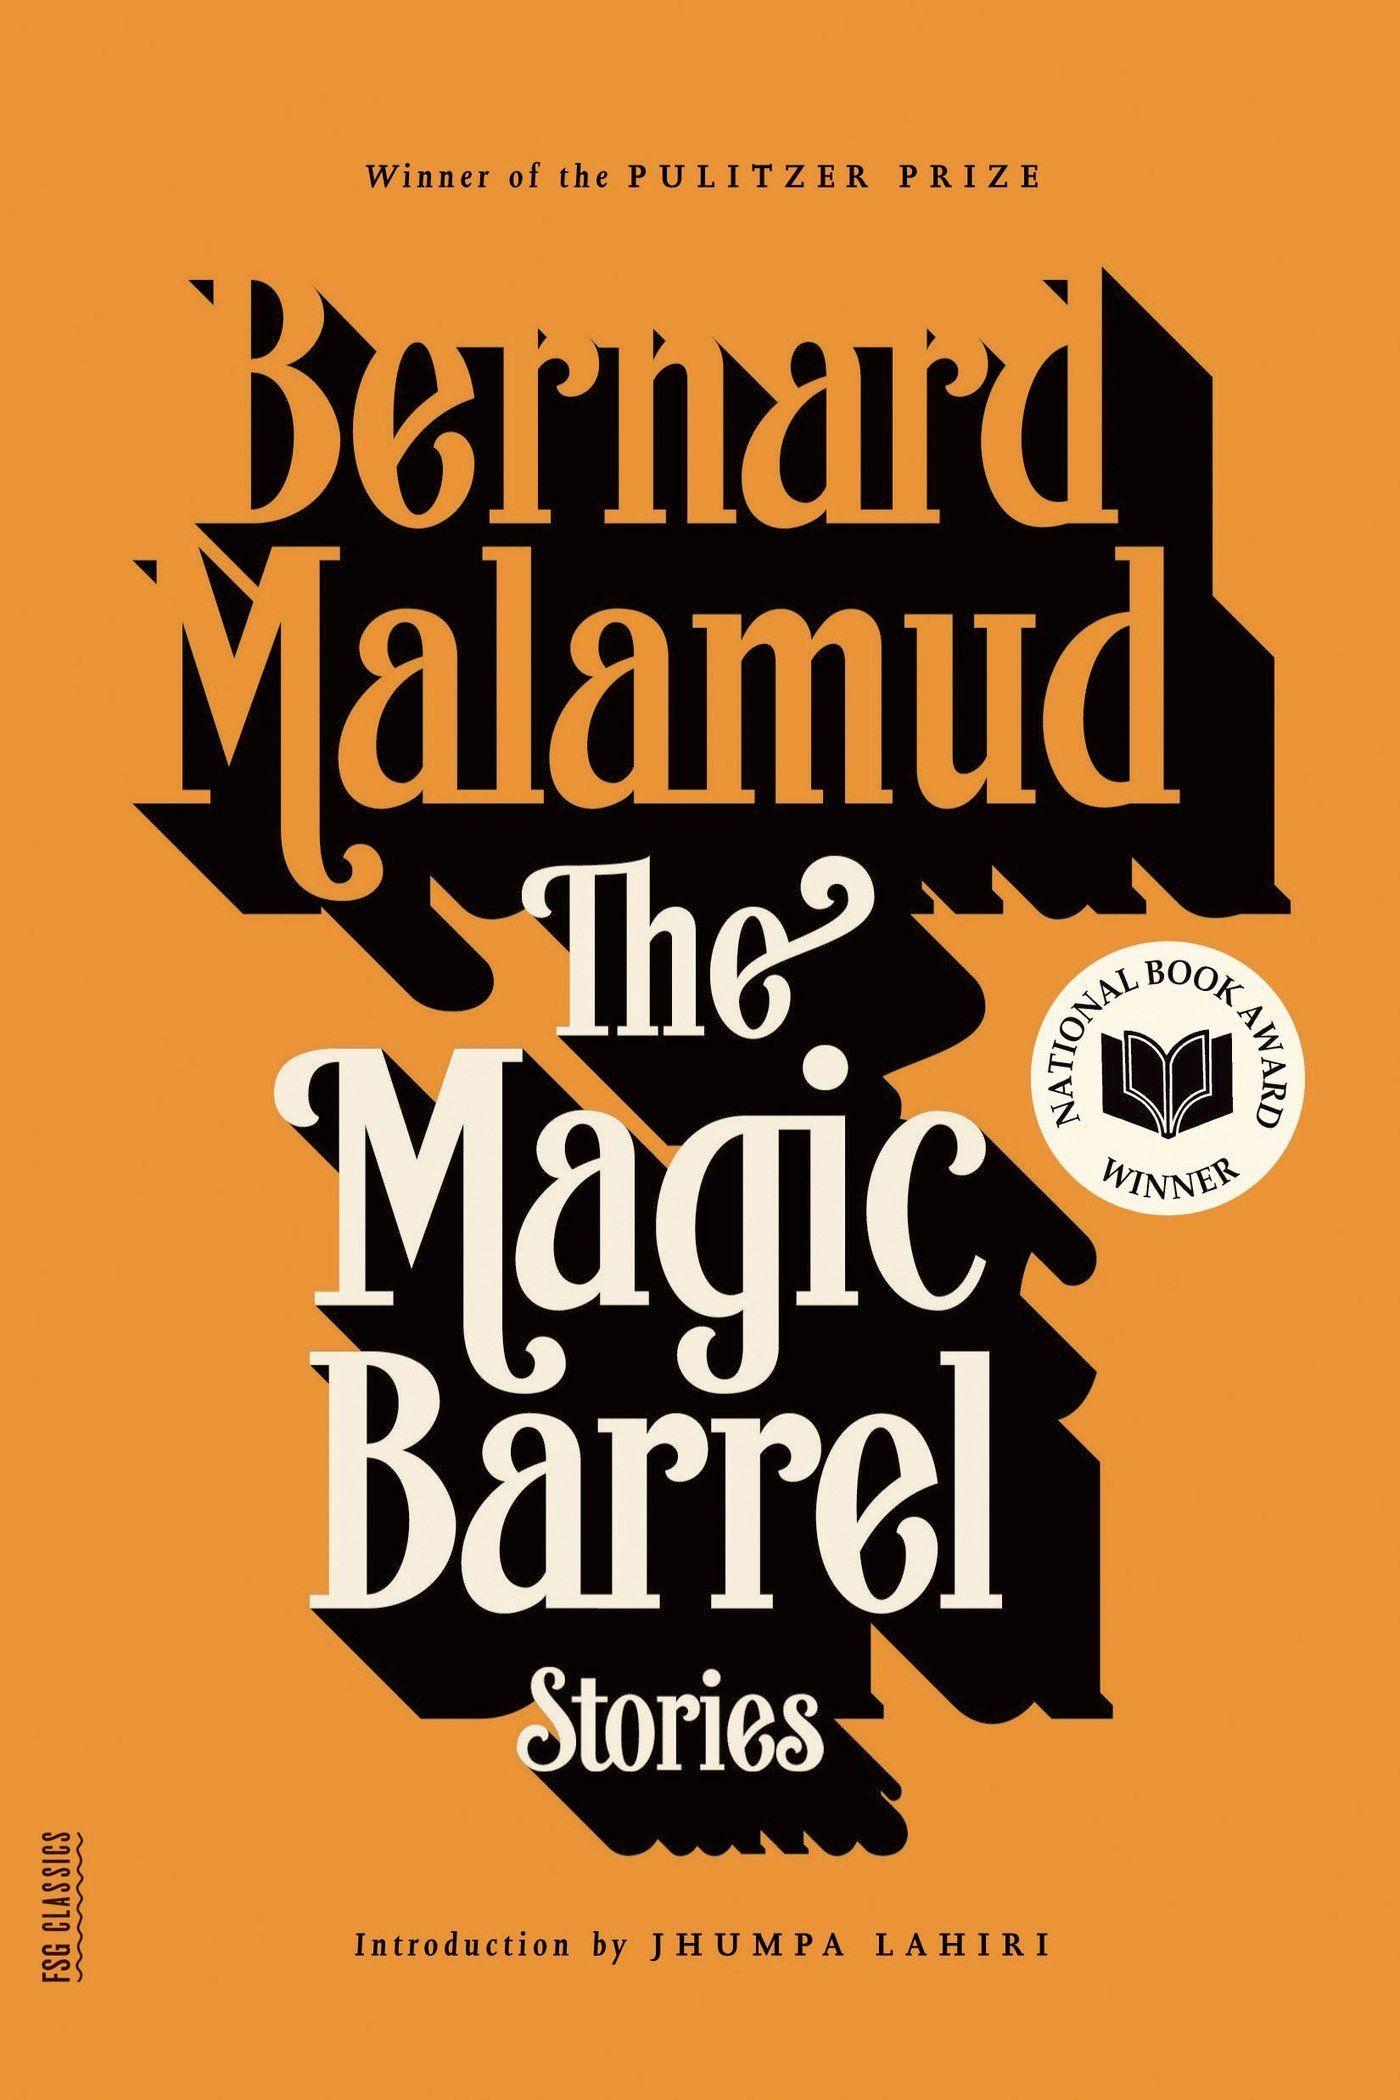 10 The Magic Barrel, by Bernard Malamud